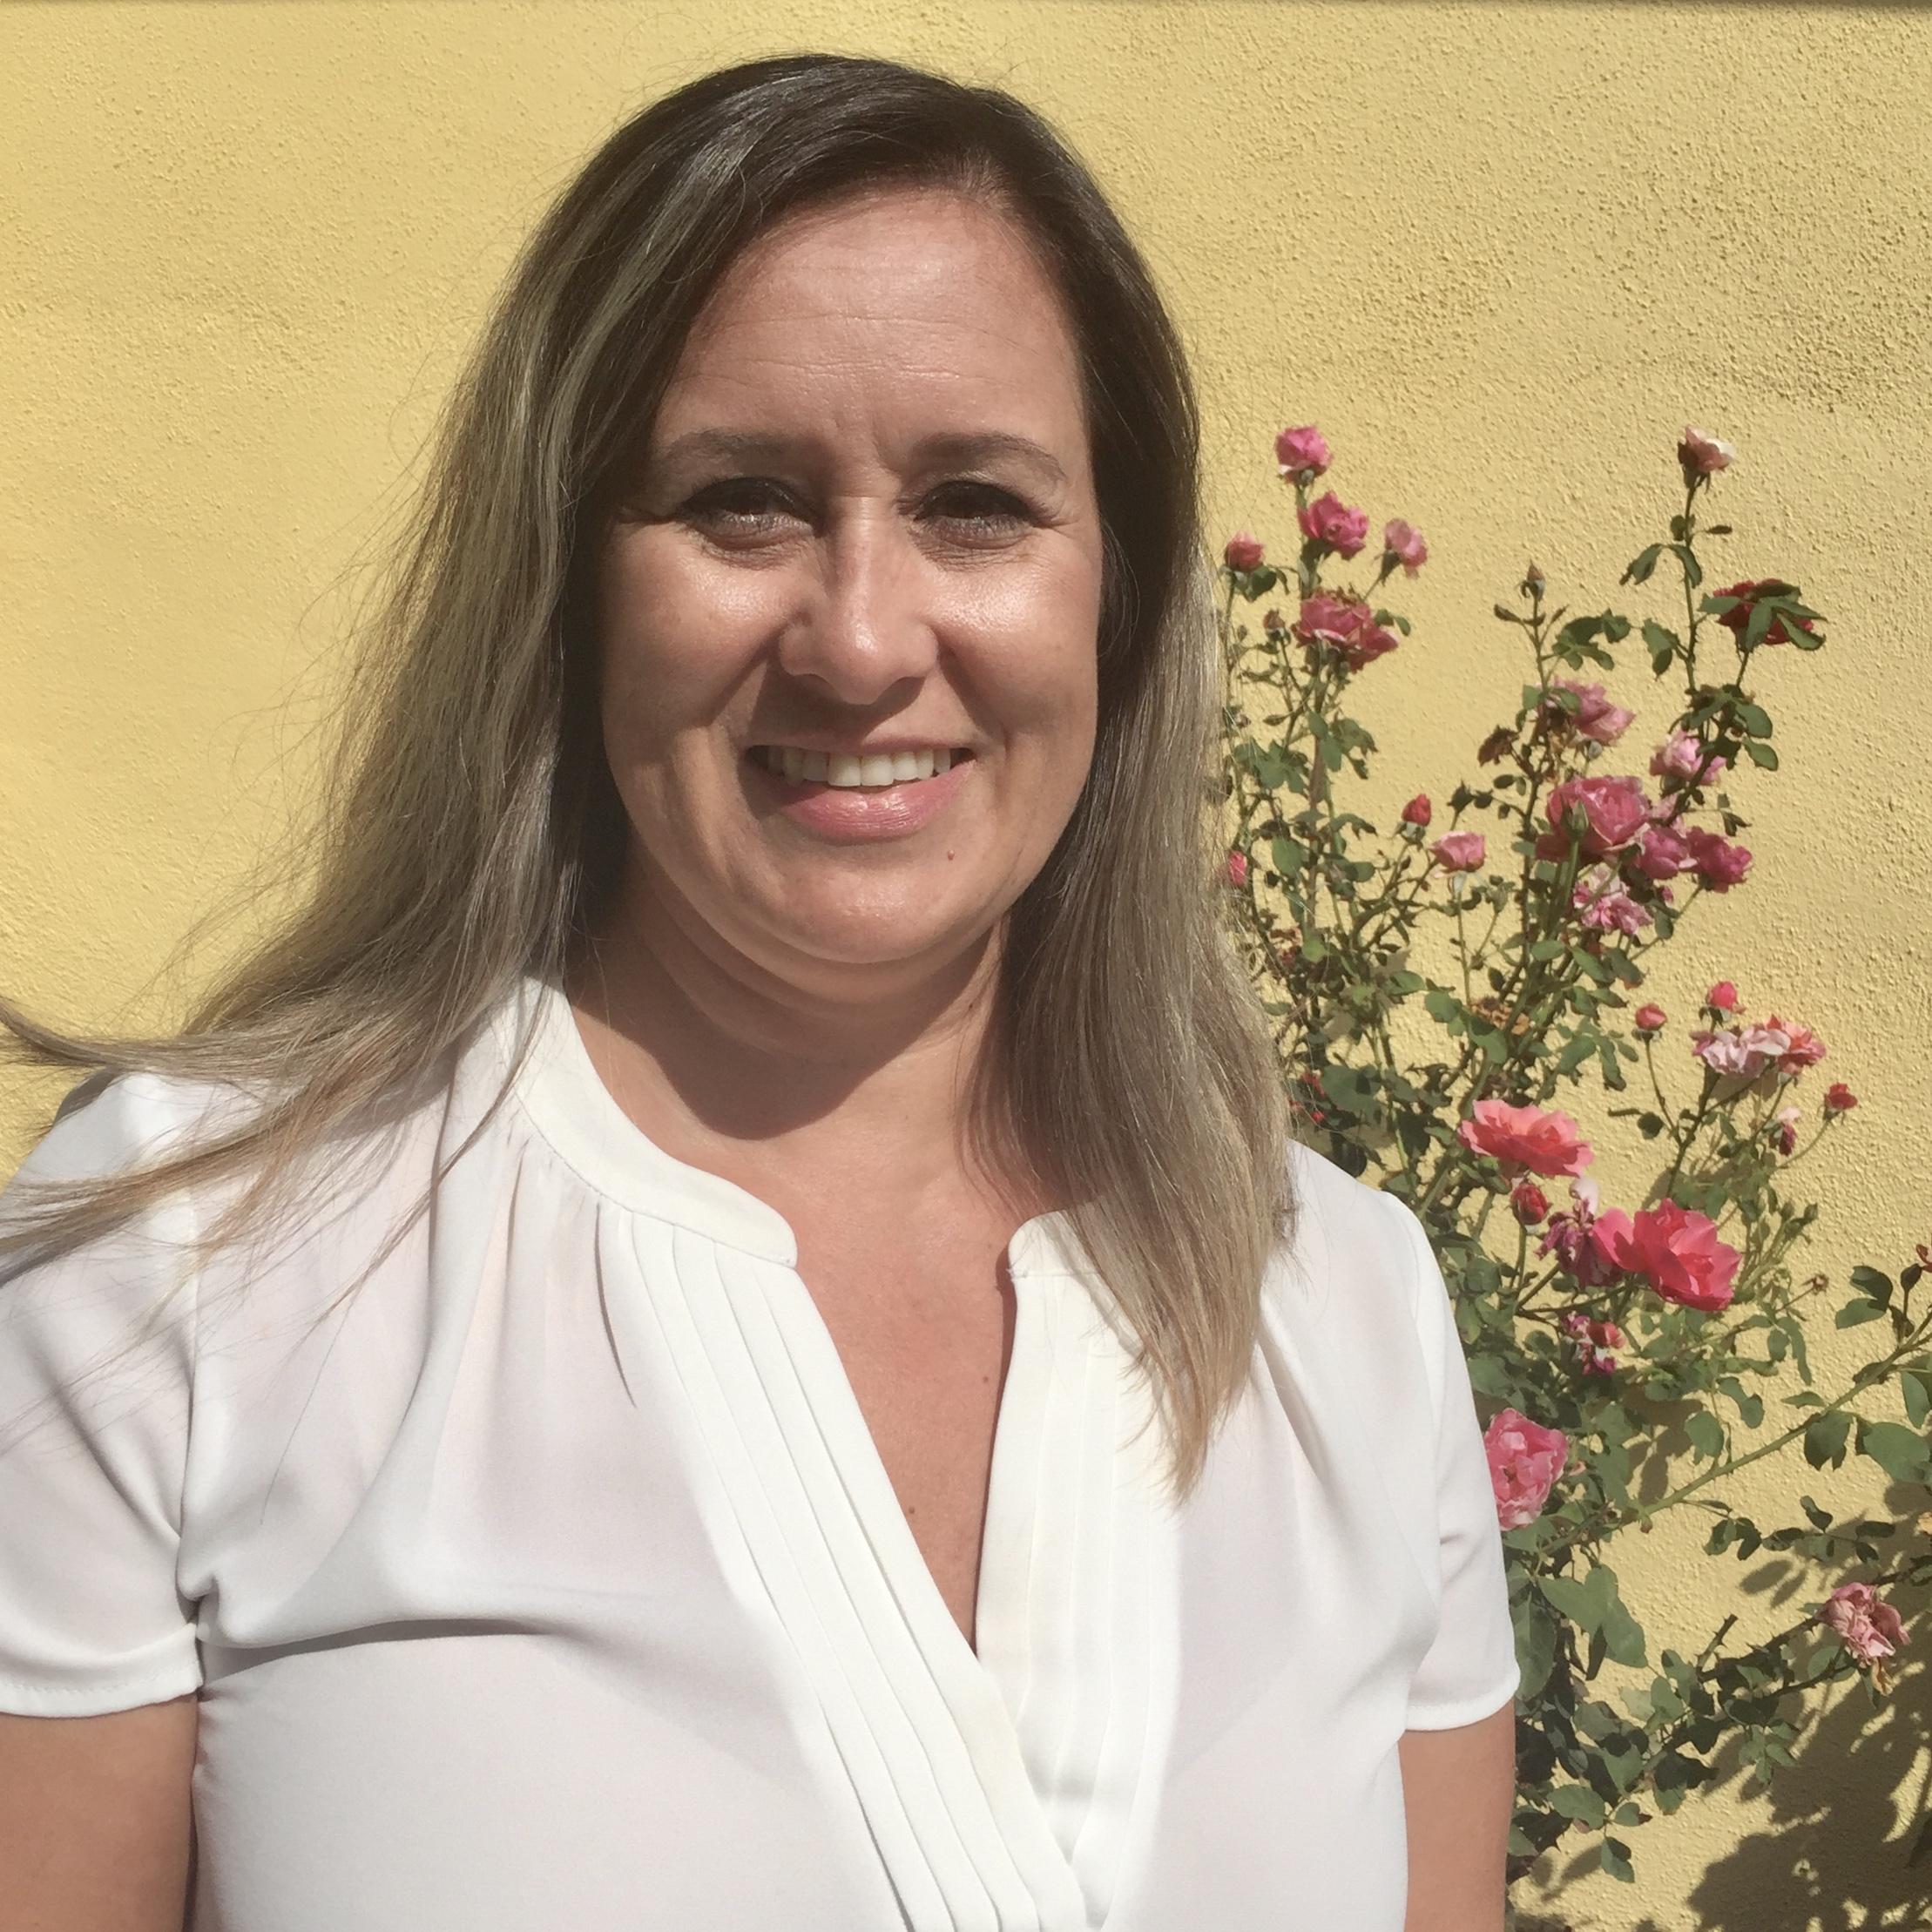 Adriana Enriquez